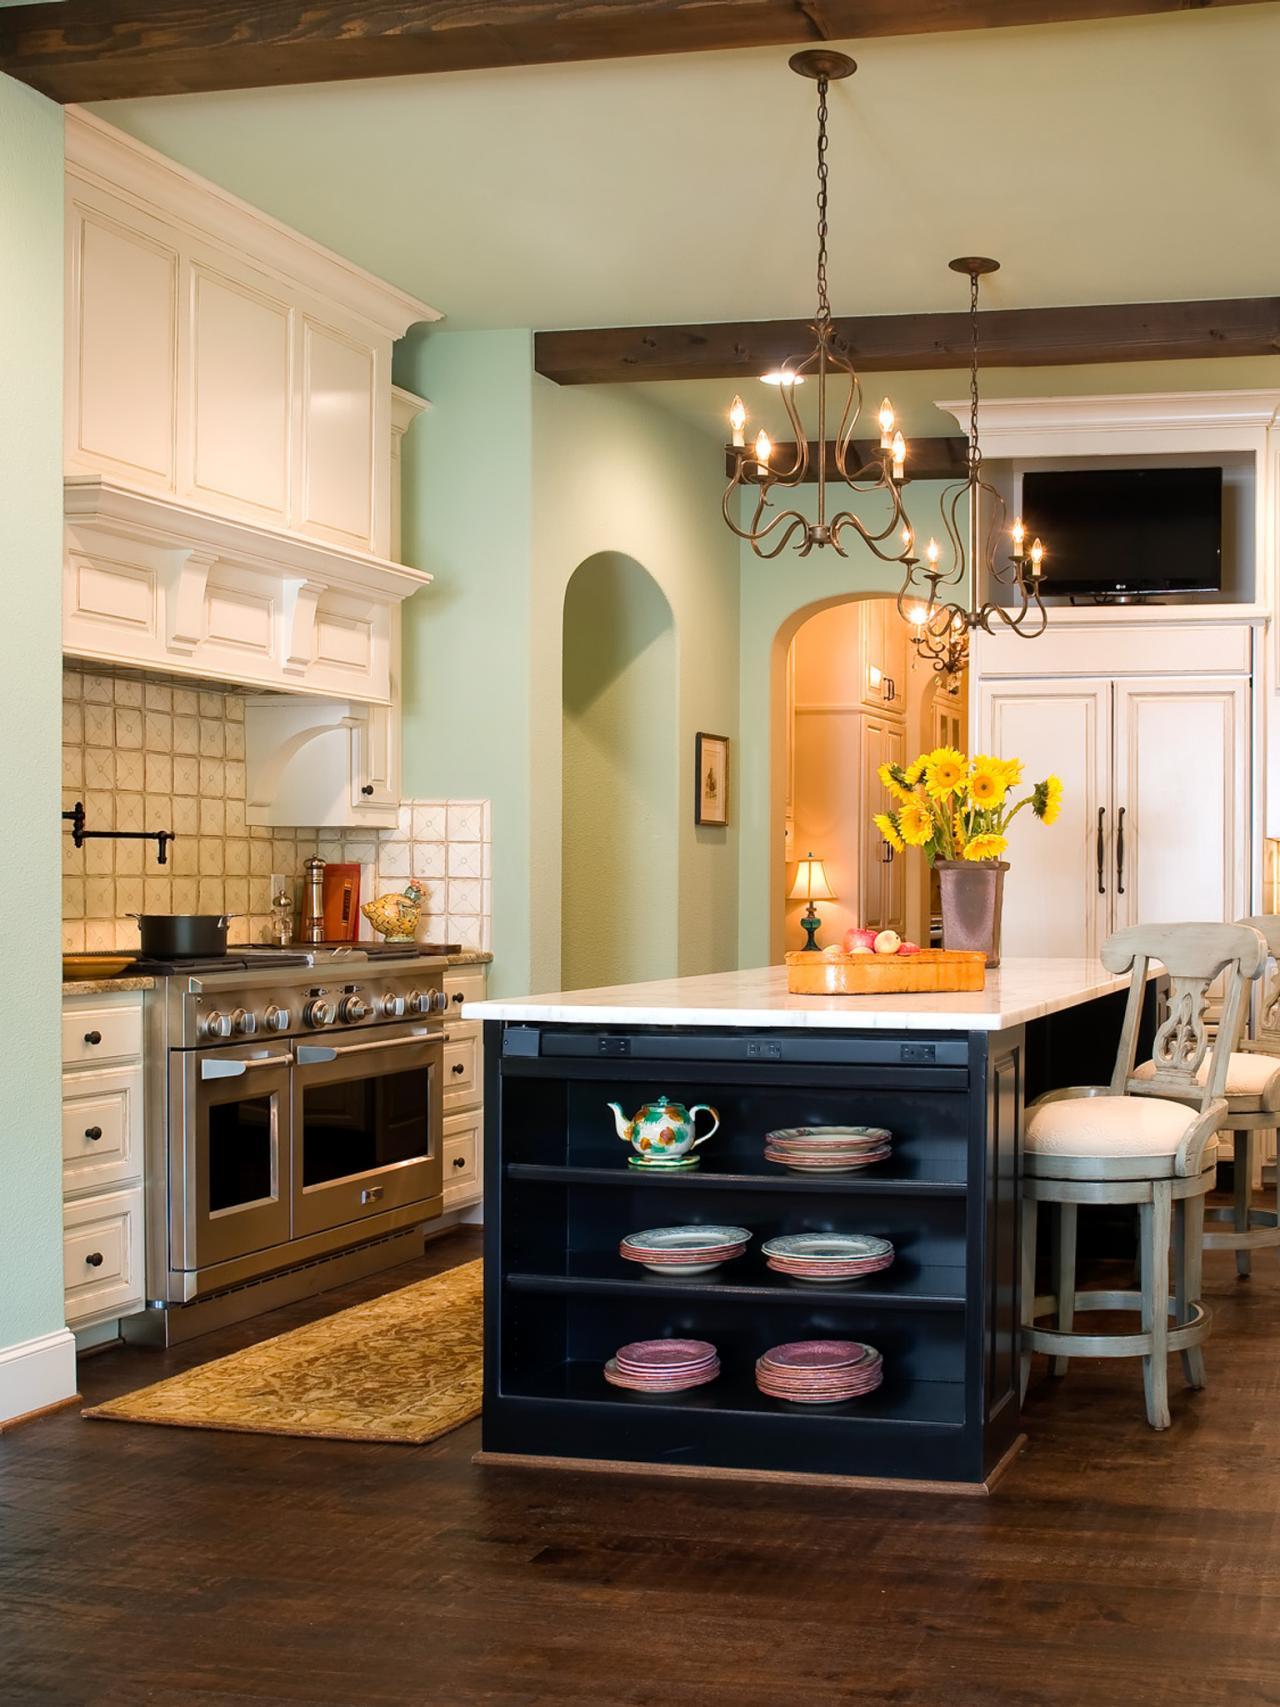 Soft Green Mediterranean Inspired Kitchen With White Cabinets